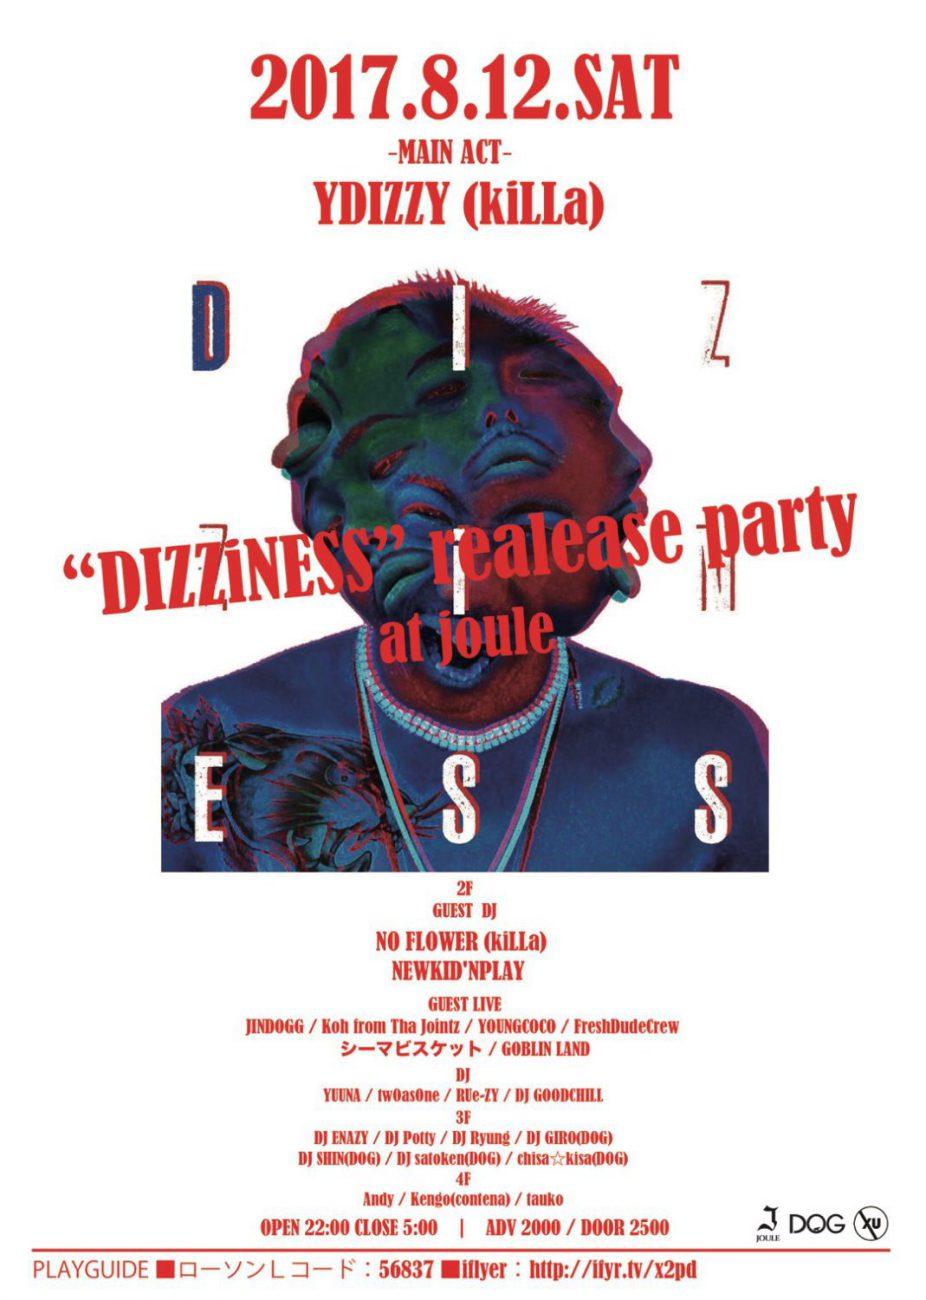 2017.8.12.DIZZiNESS-1